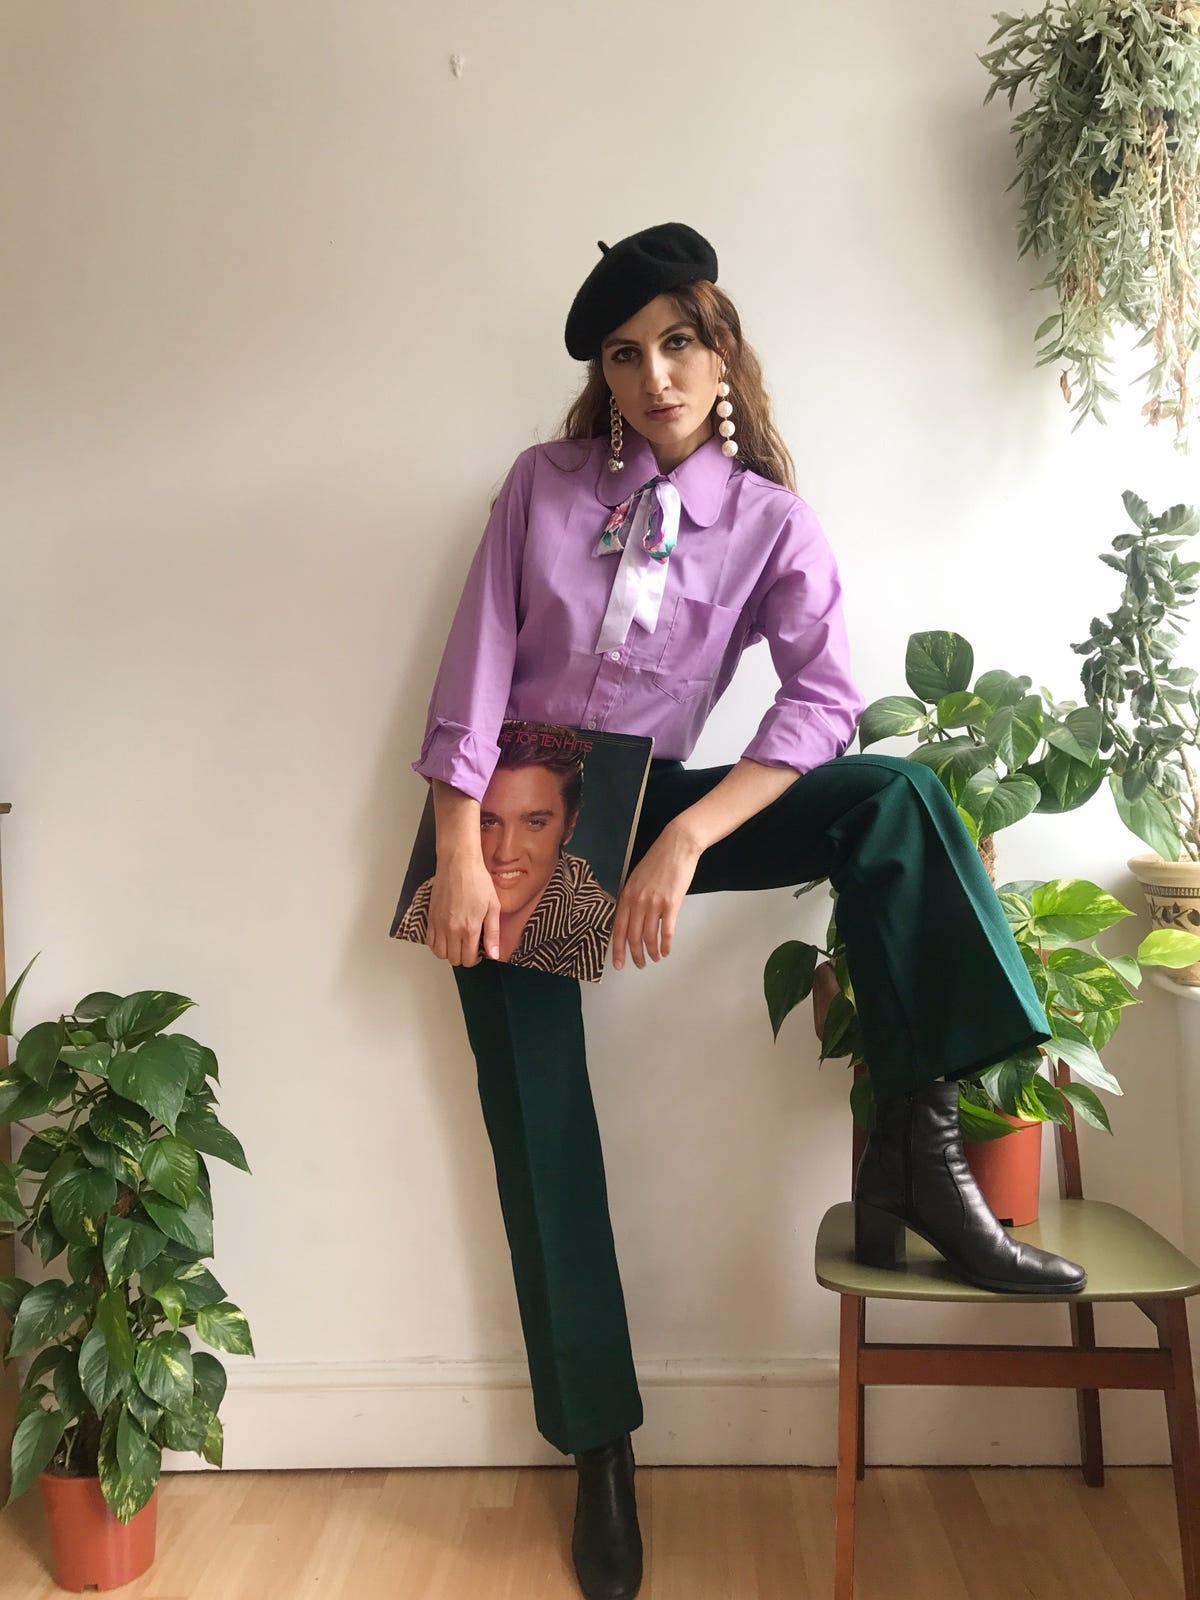 b3a74e64e9cc Vintage Fashion Depop Business - Madseventies